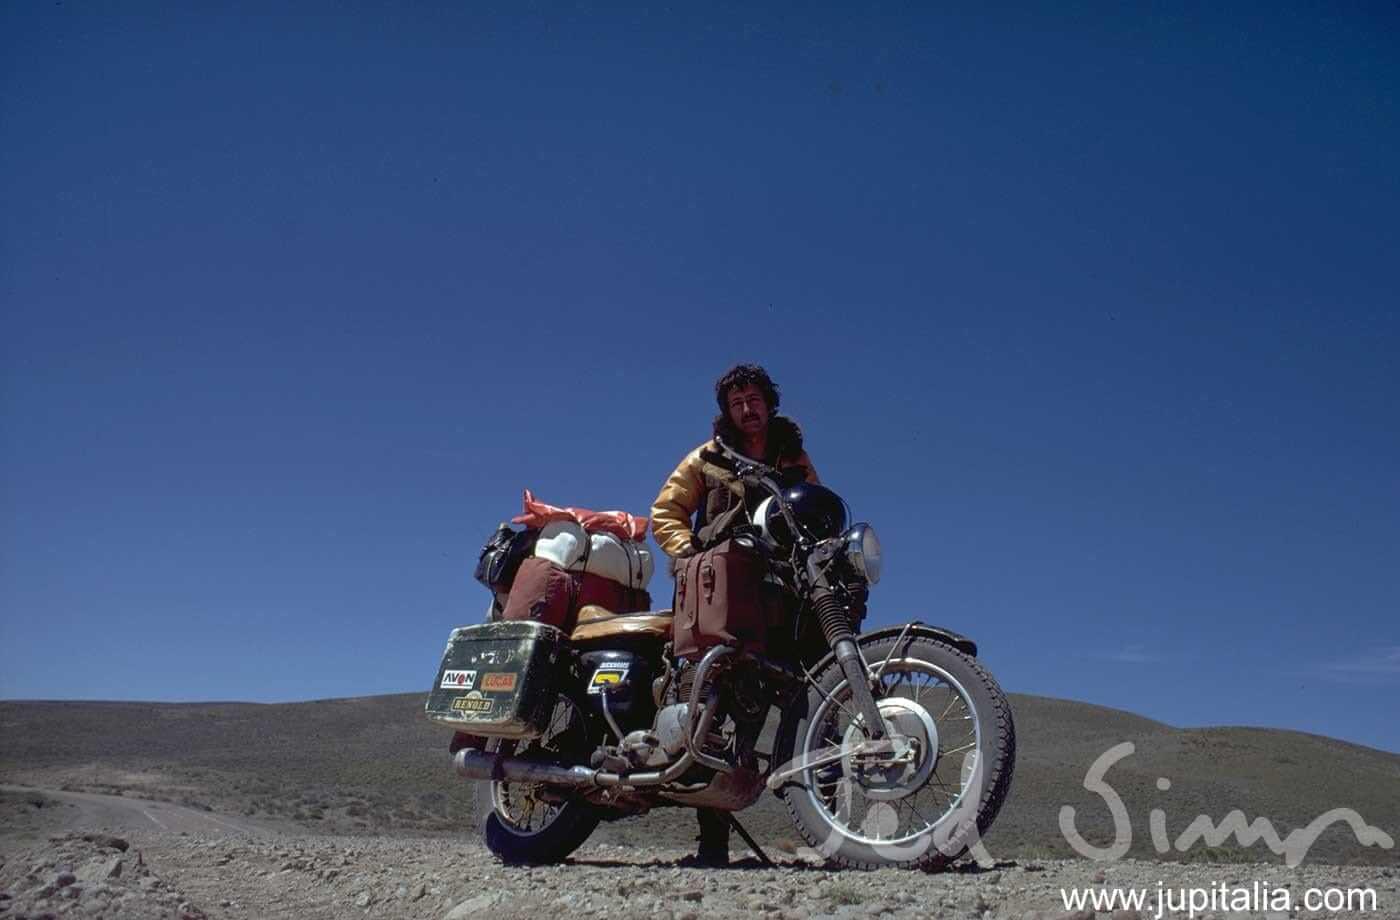 Ted Simon Jupiters Travels